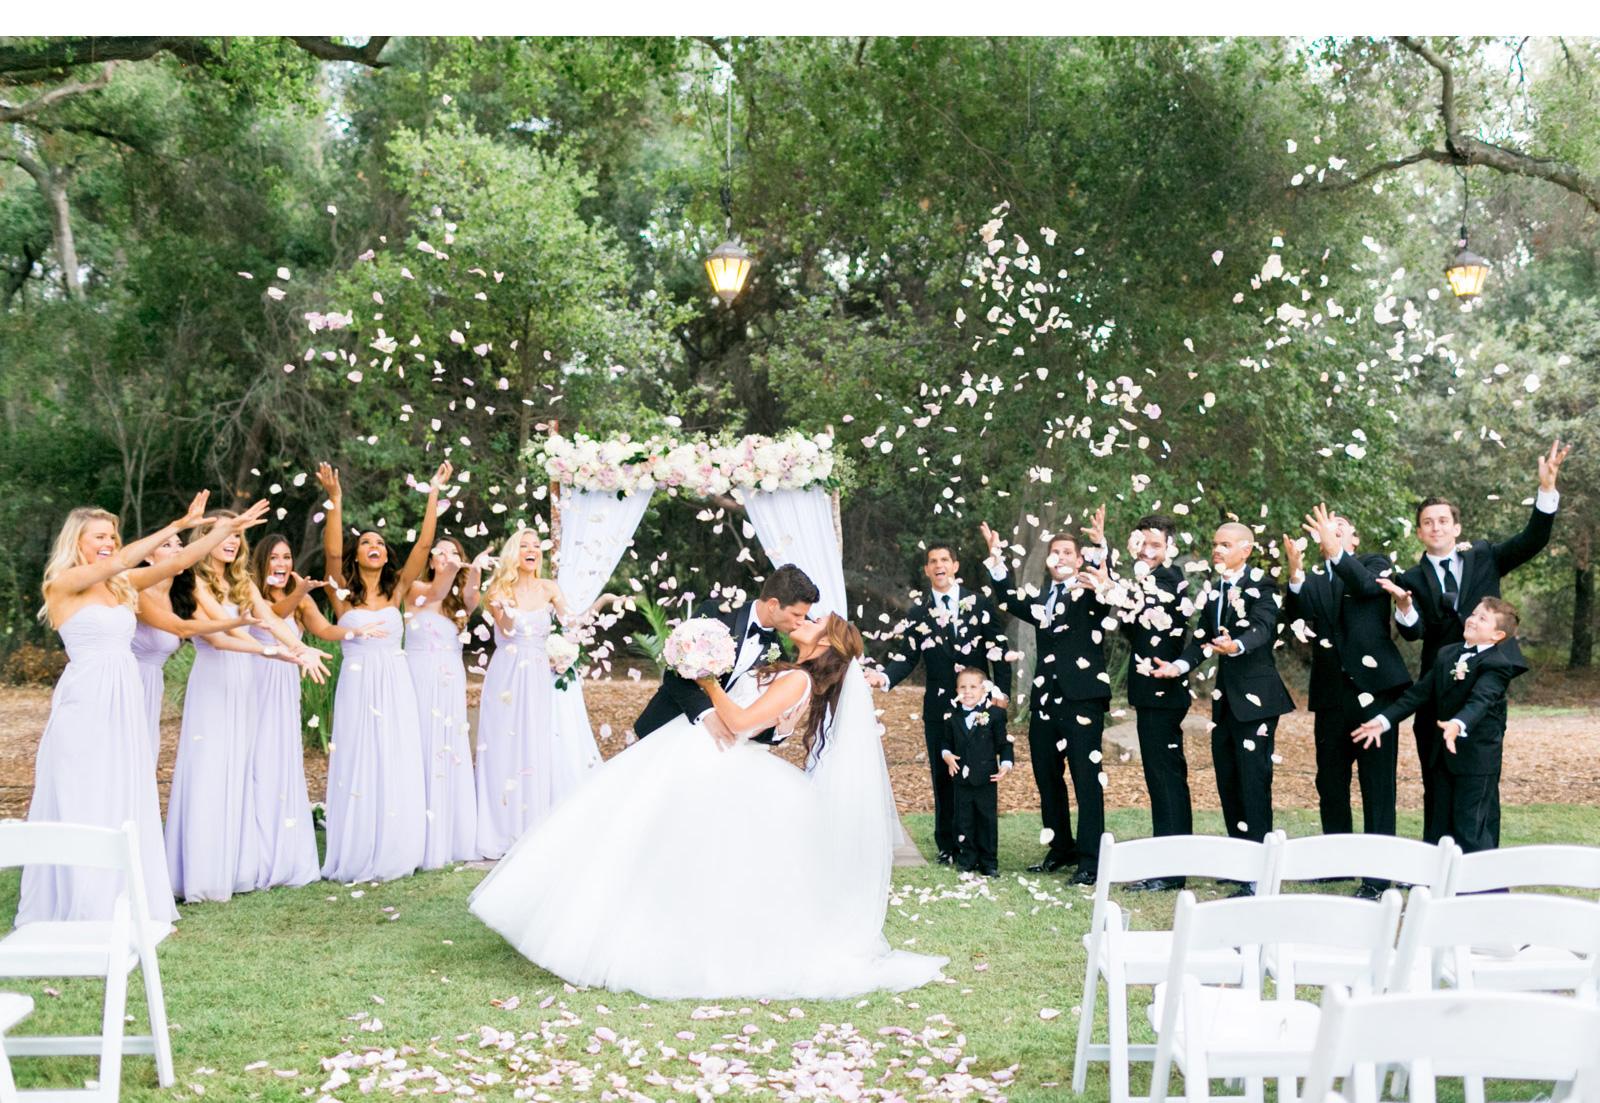 Miss-USA-Nia-Sanchez-Temecula-Wedding-Natalie-Schutt-Photography_06.jpg